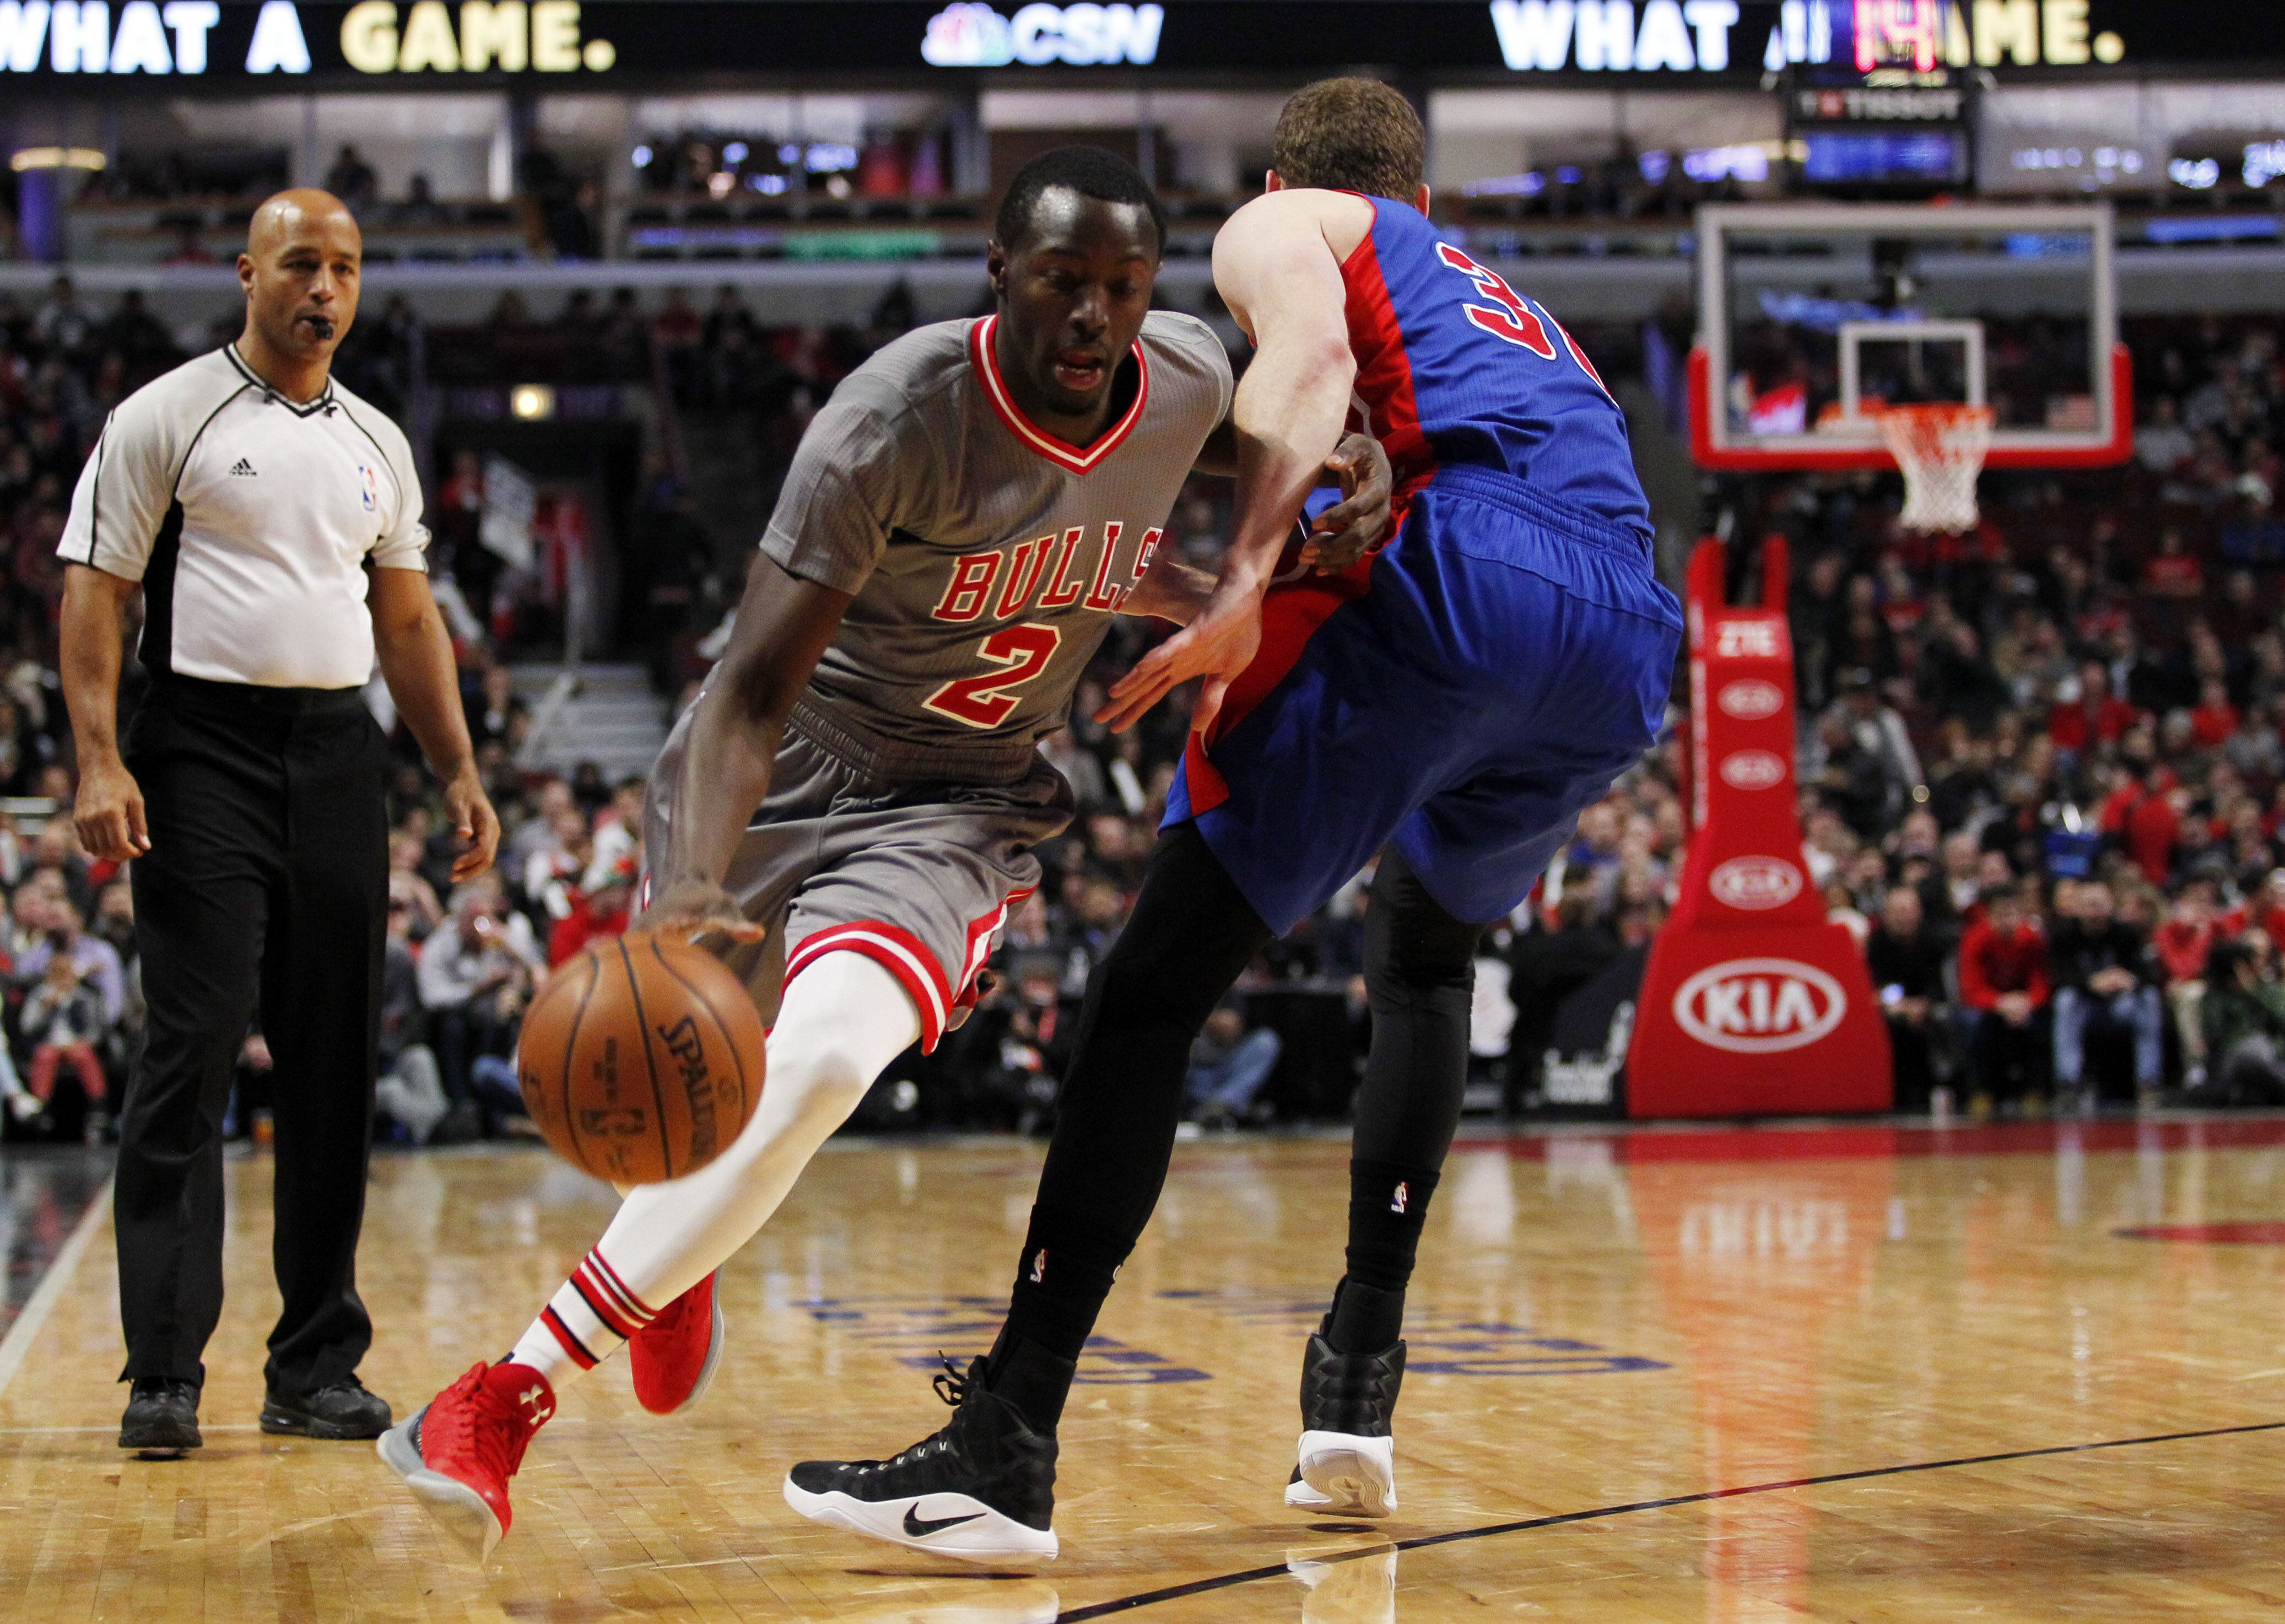 Bulls Vs Pistons | BullsVsPistons